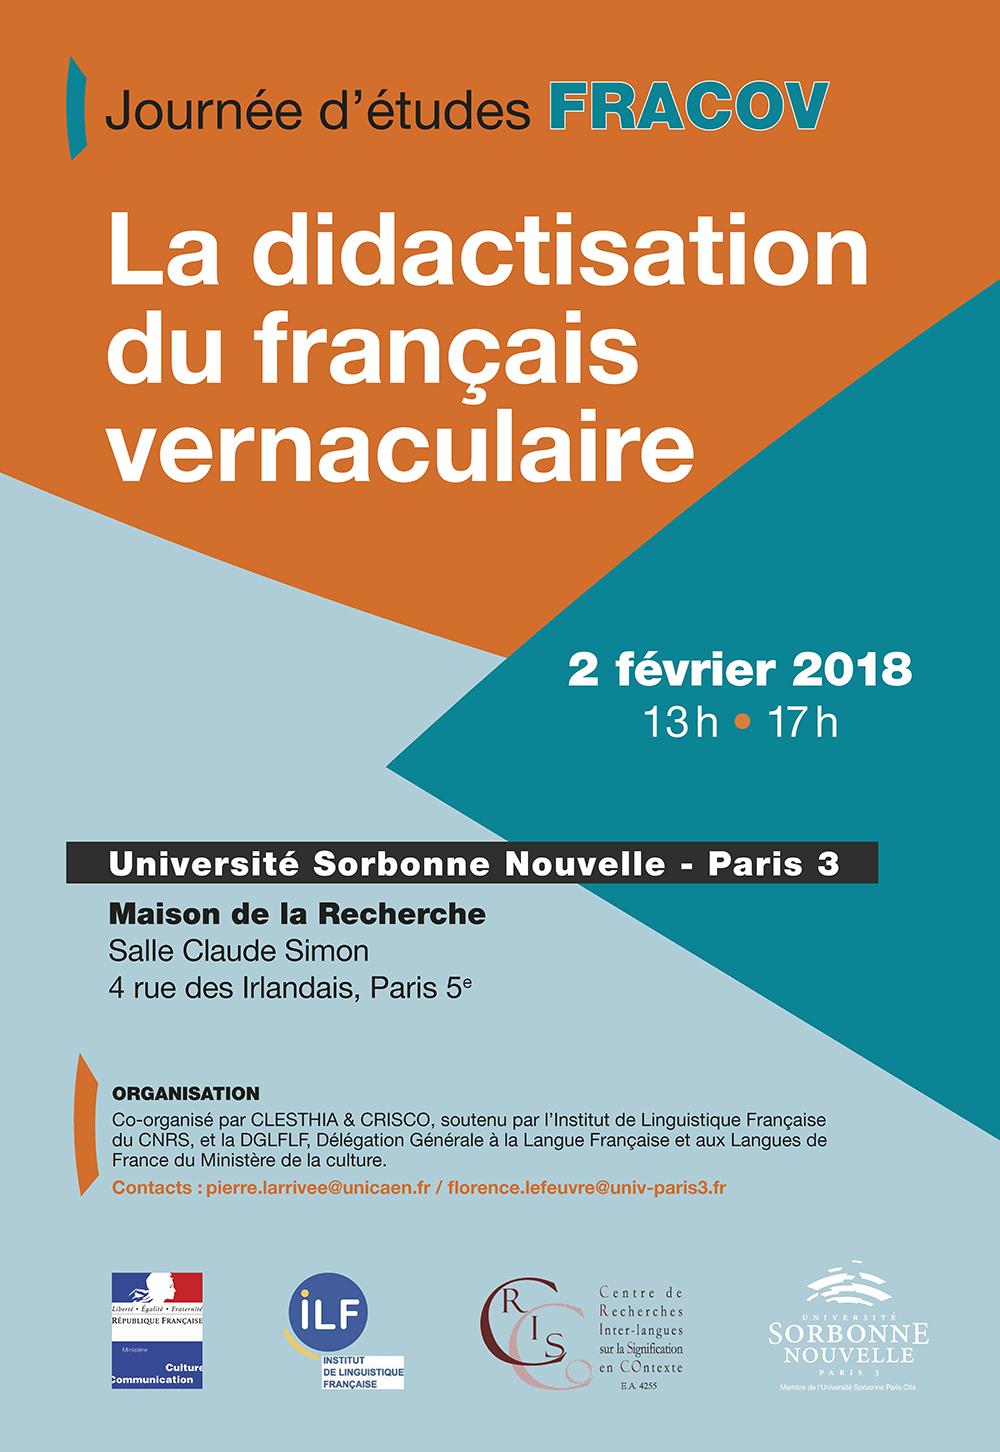 affichefracov-didactisation-du-francais-vernaculaire-bleuorange-1-.jpg